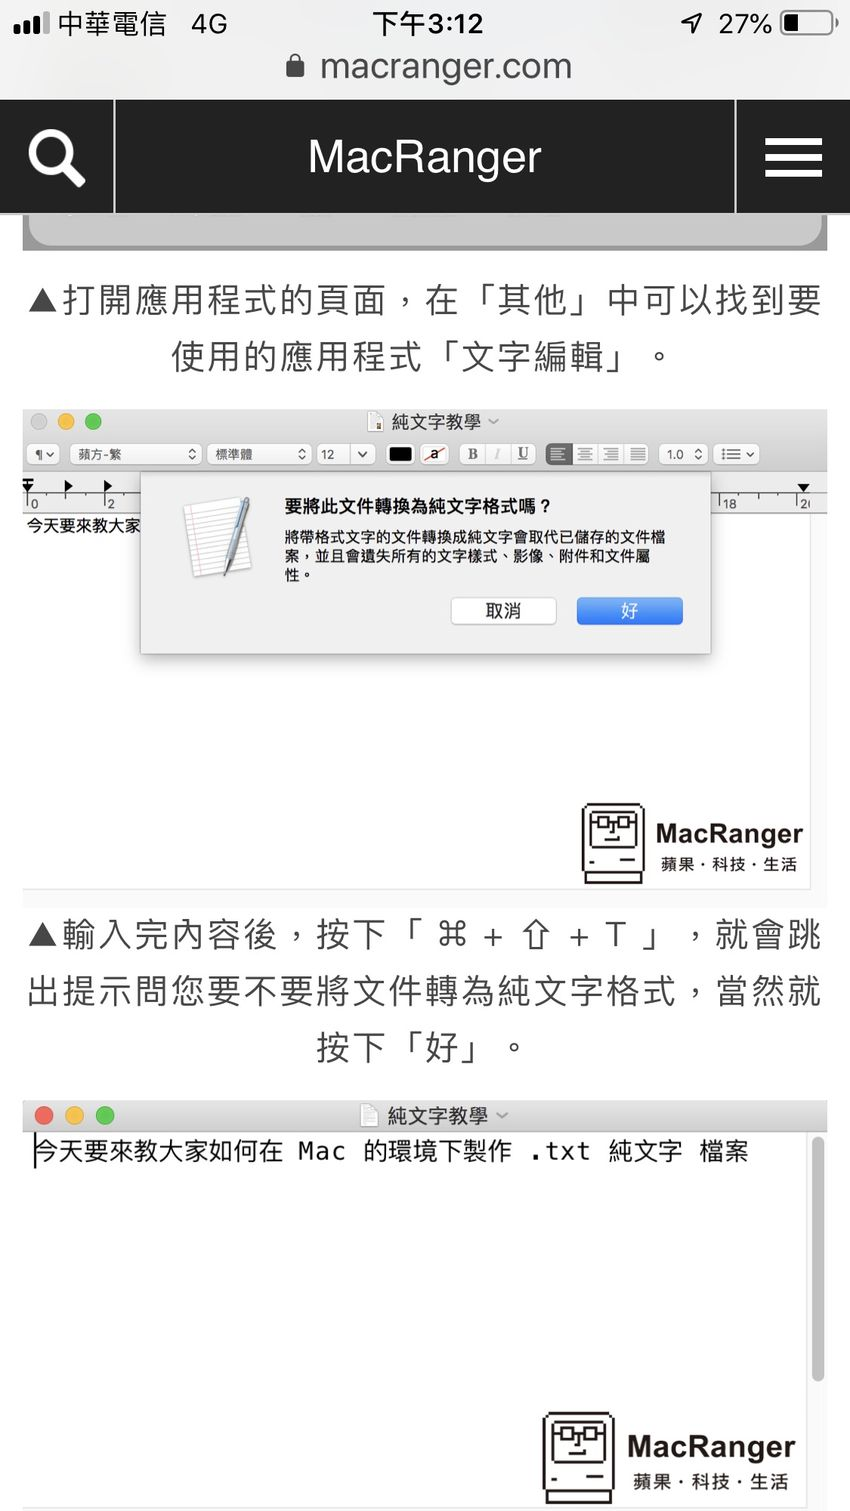 invisible-character-on-web-mobile-8.jpg-網頁出現看不見的特殊字元或方框時,該如何處理?